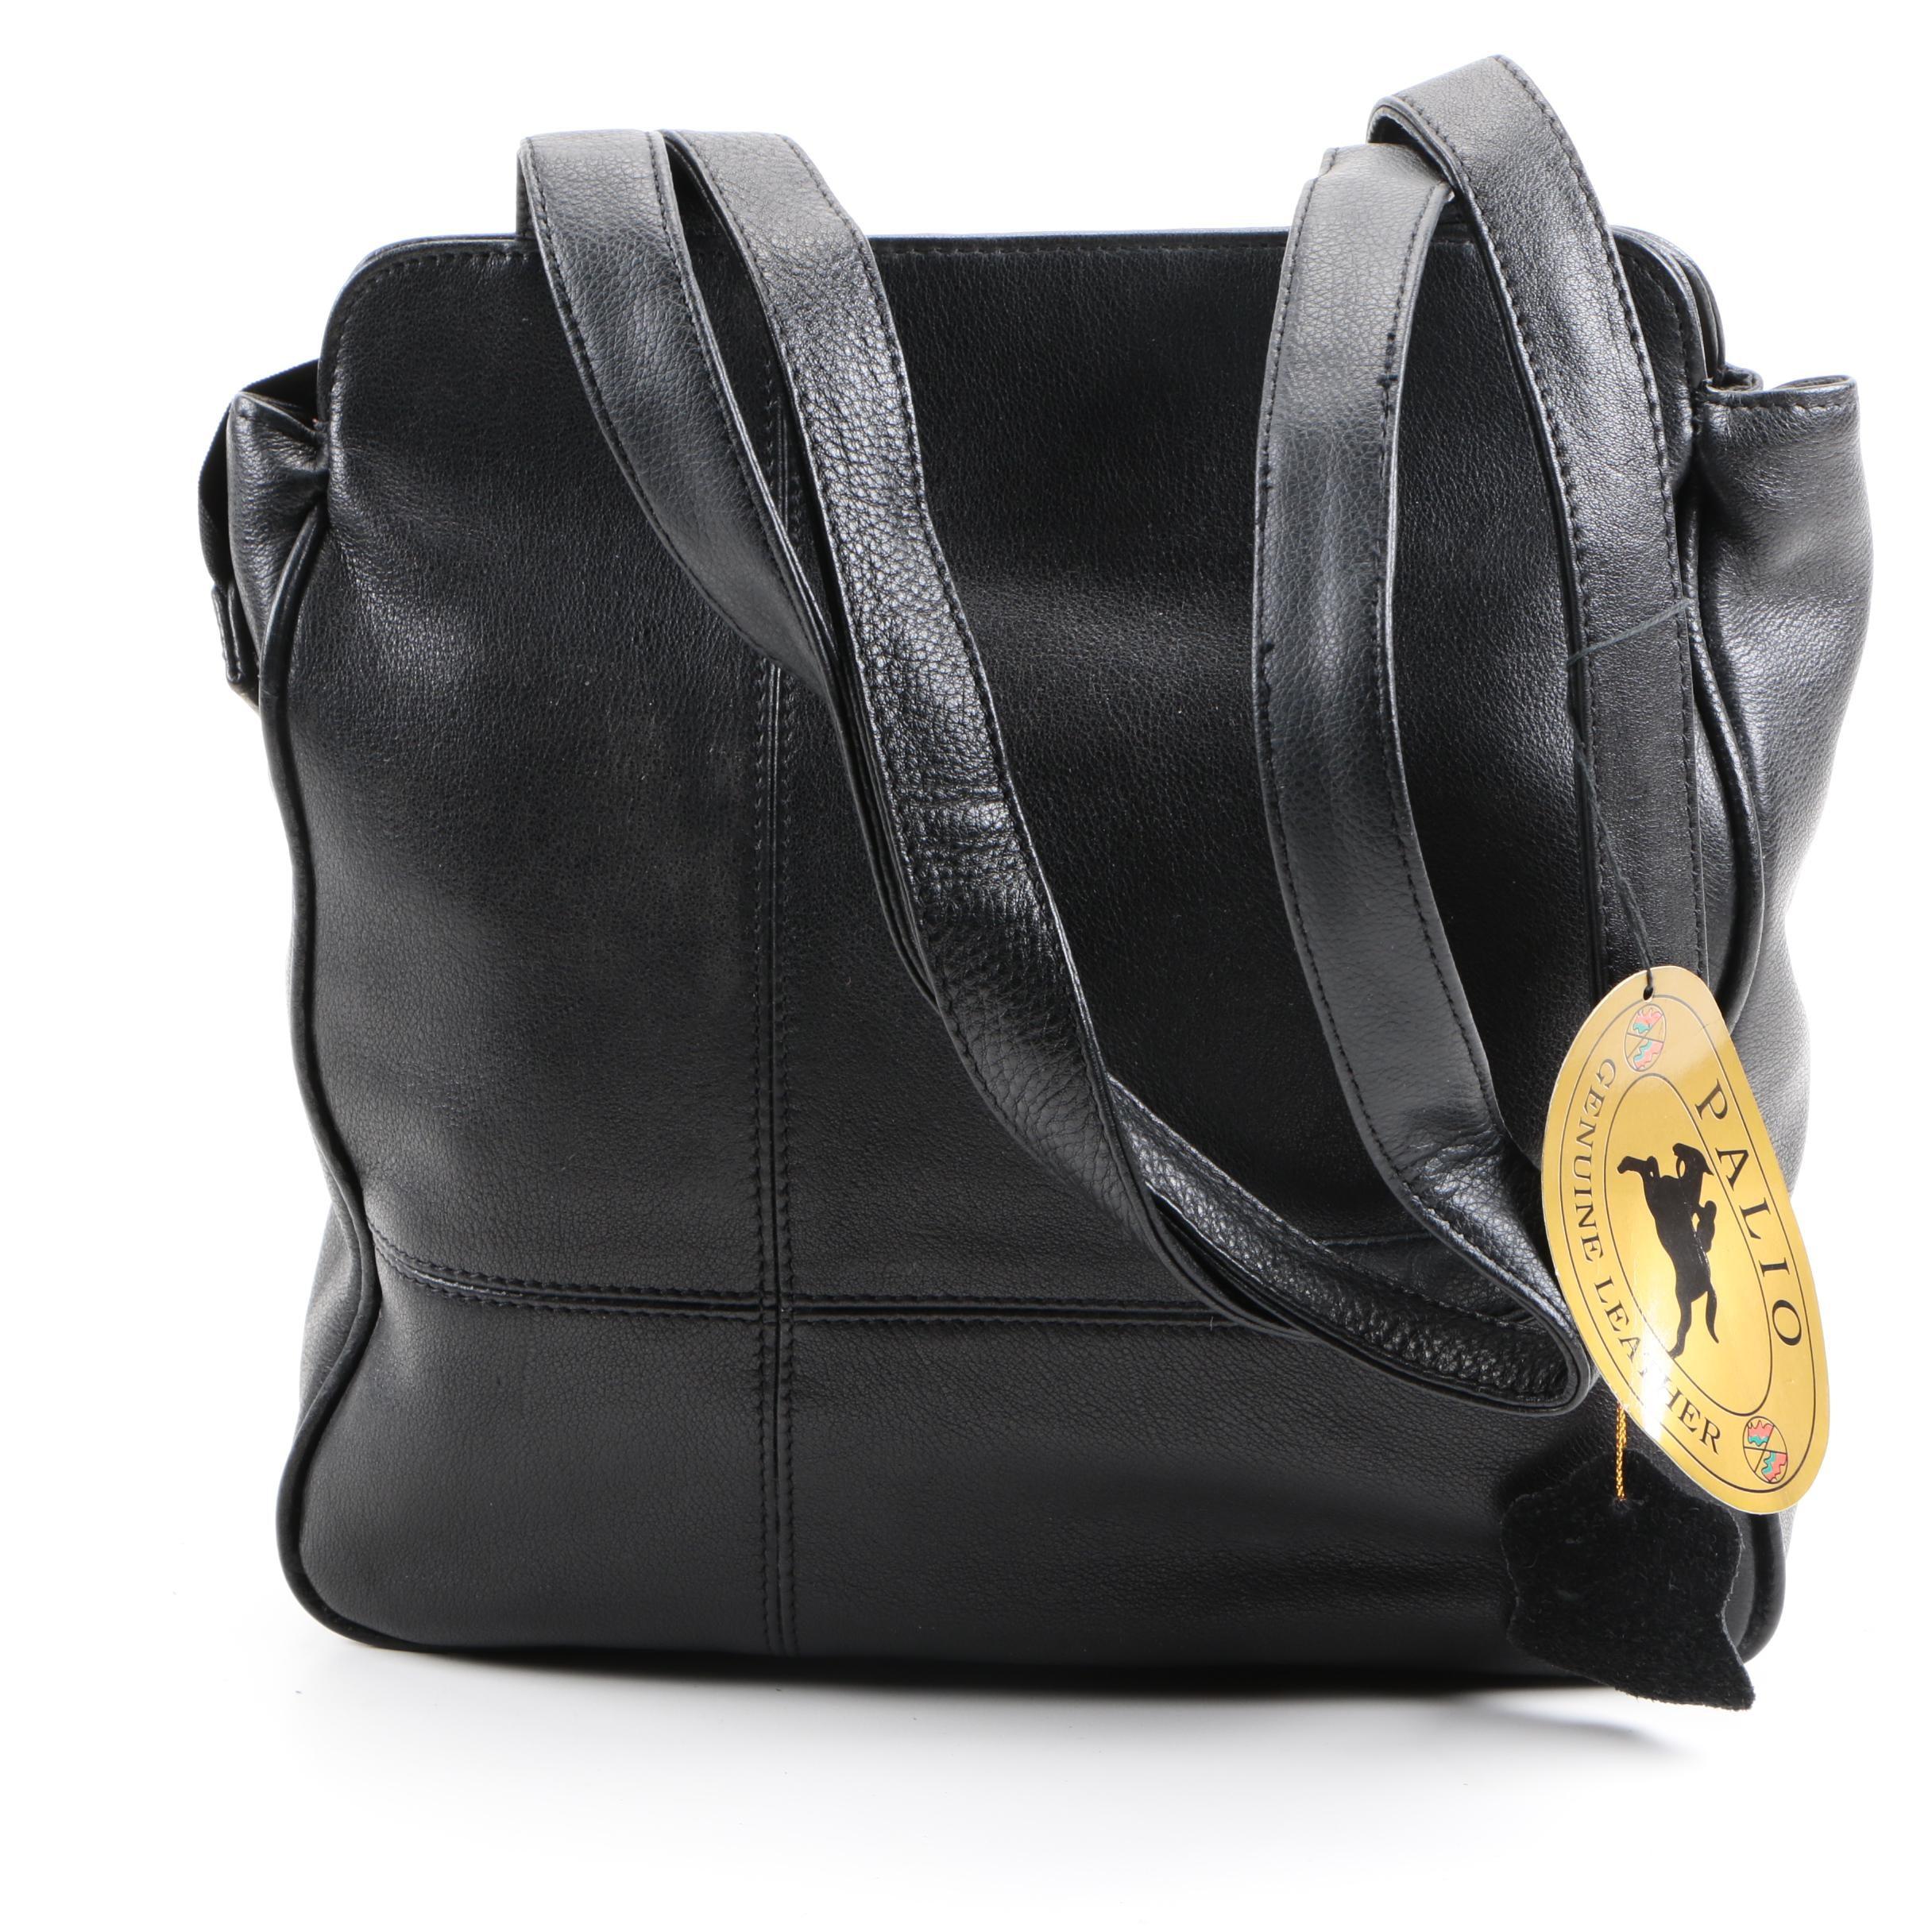 Palio Black Leather Tote